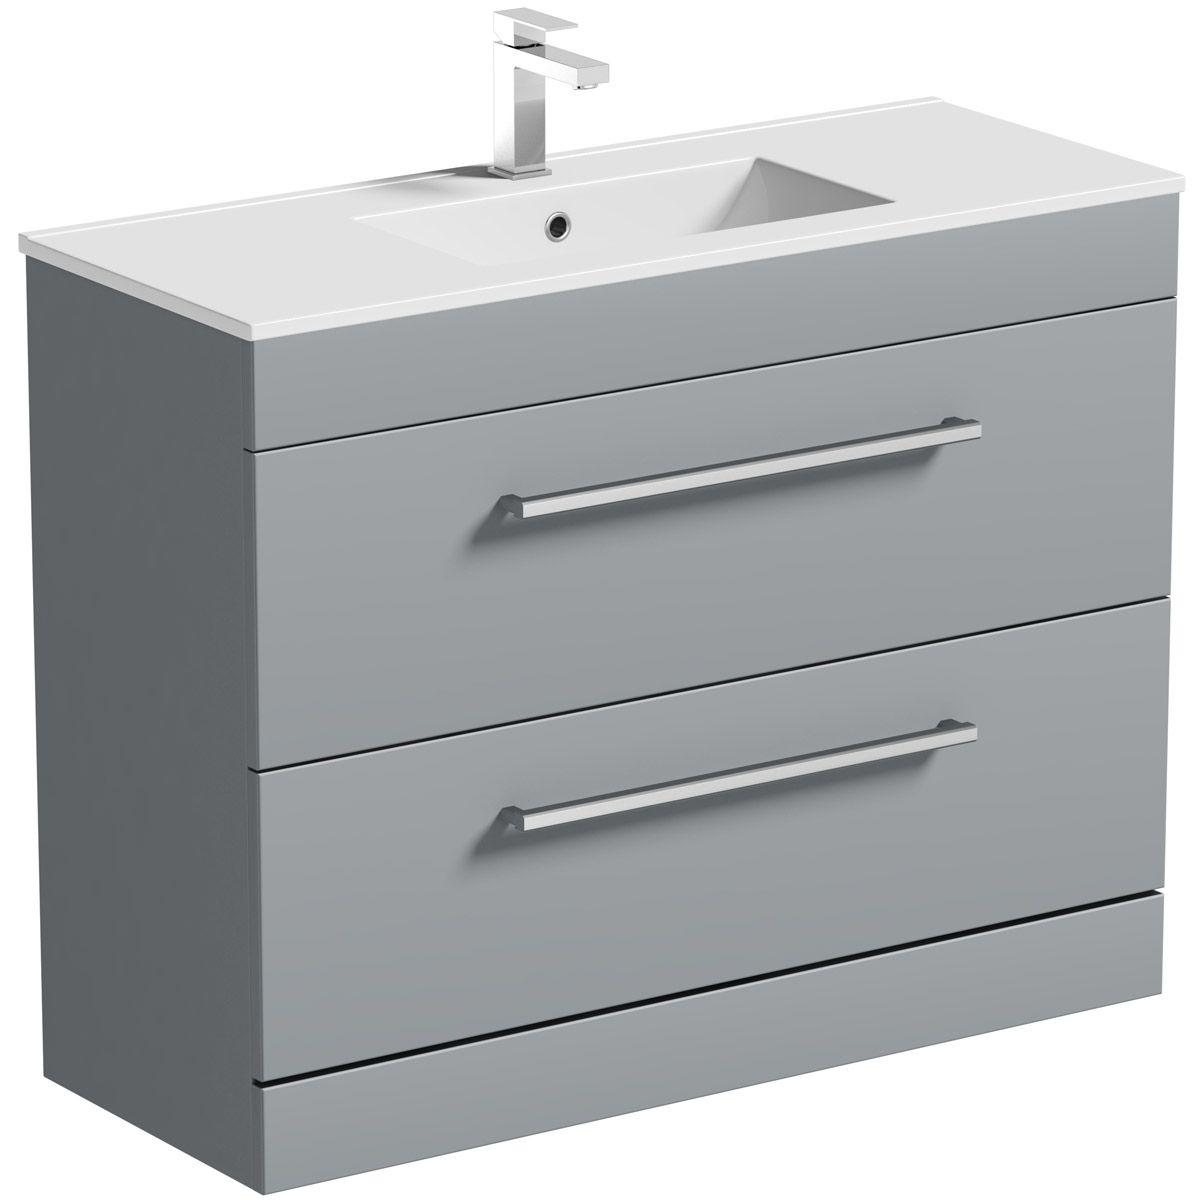 Orchard Derwent Stone Grey Floorstanding Vanity Unit And Ceramic Basin 1000mm Vanity Units Vanity Drawers Basin